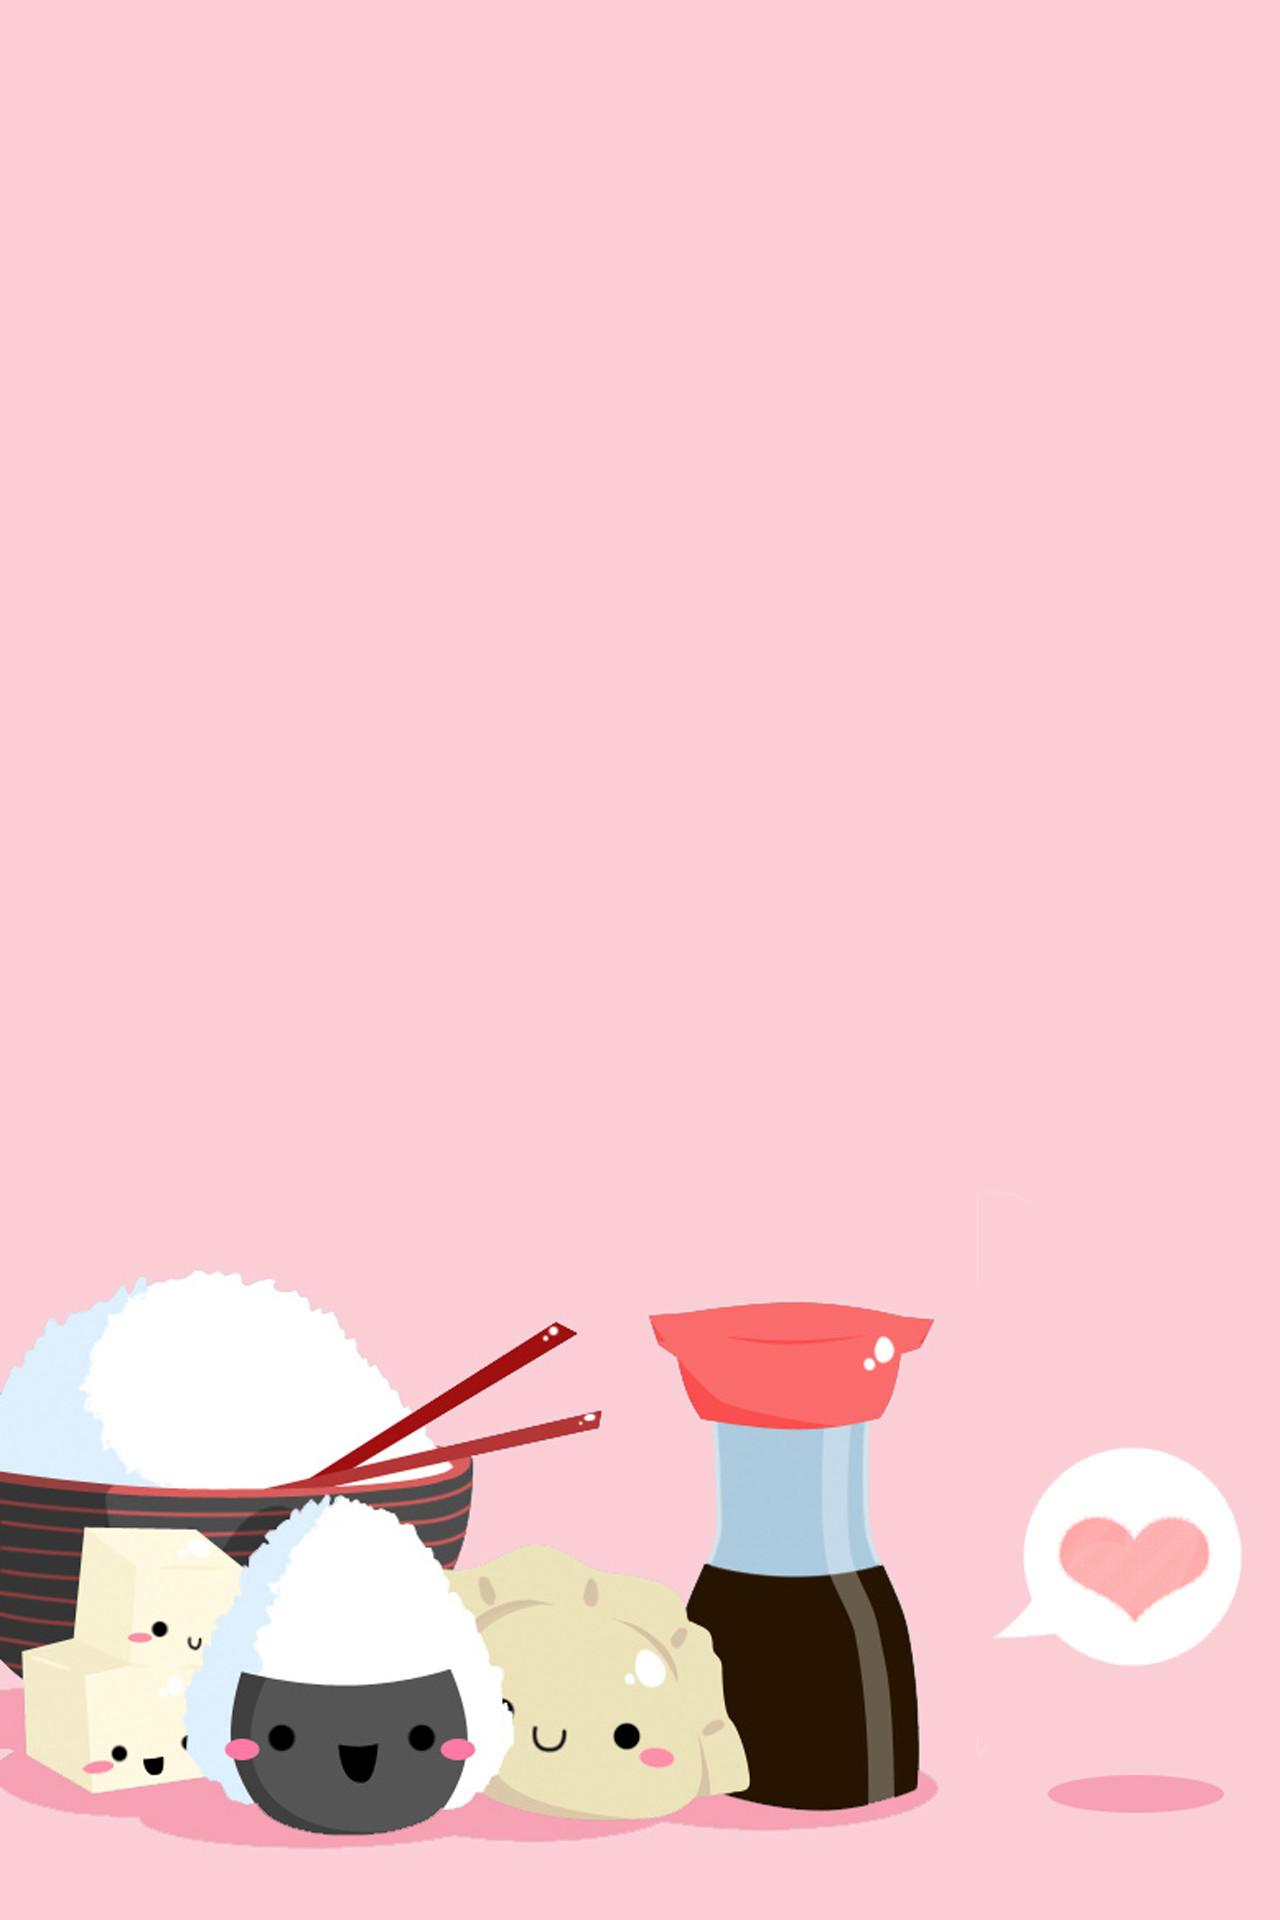 Cute Cartoon Food Wallpapers 67 Images